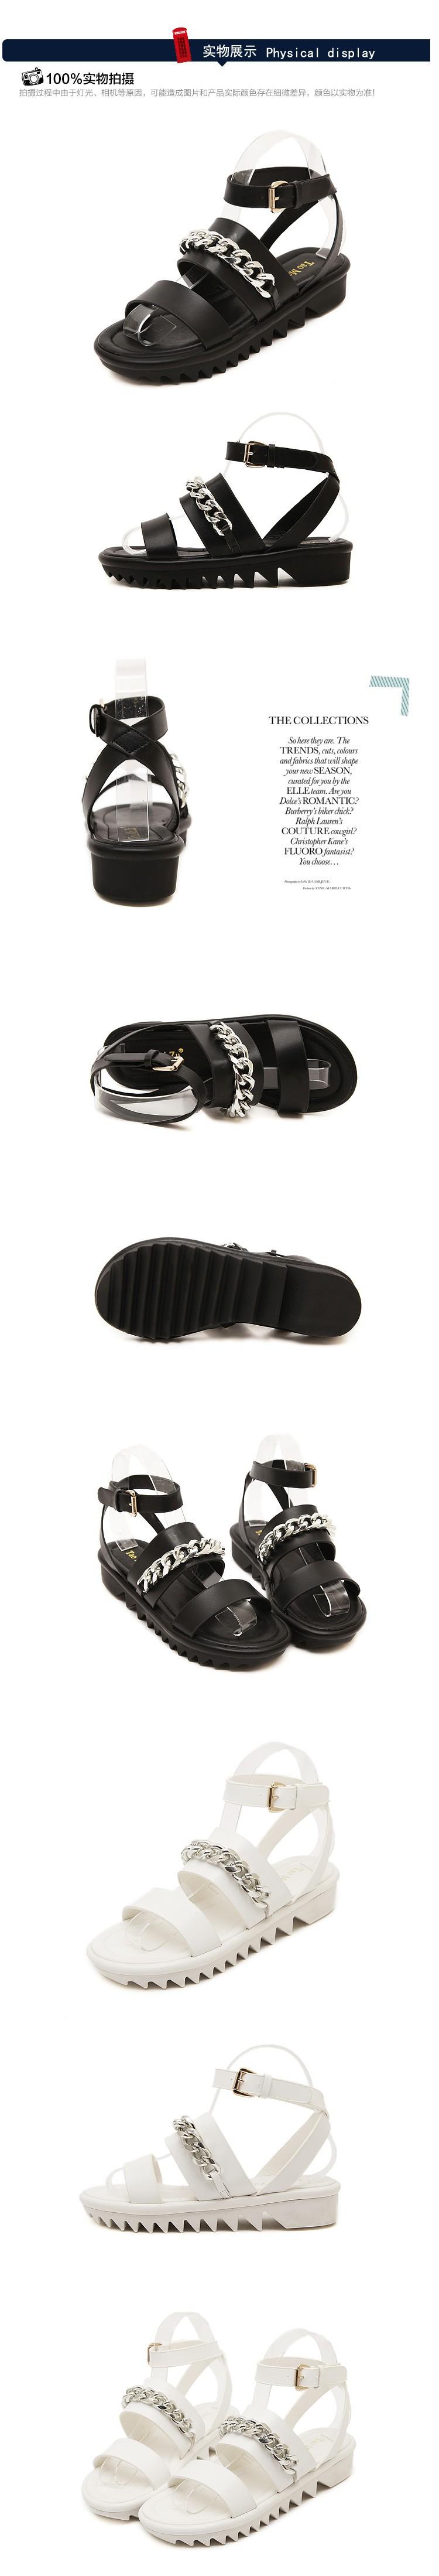 Platform Sandals 2015 Summer Style Teeth Bottom Shoes Women Black Tendencies Footbed Hitam 43 Product Description